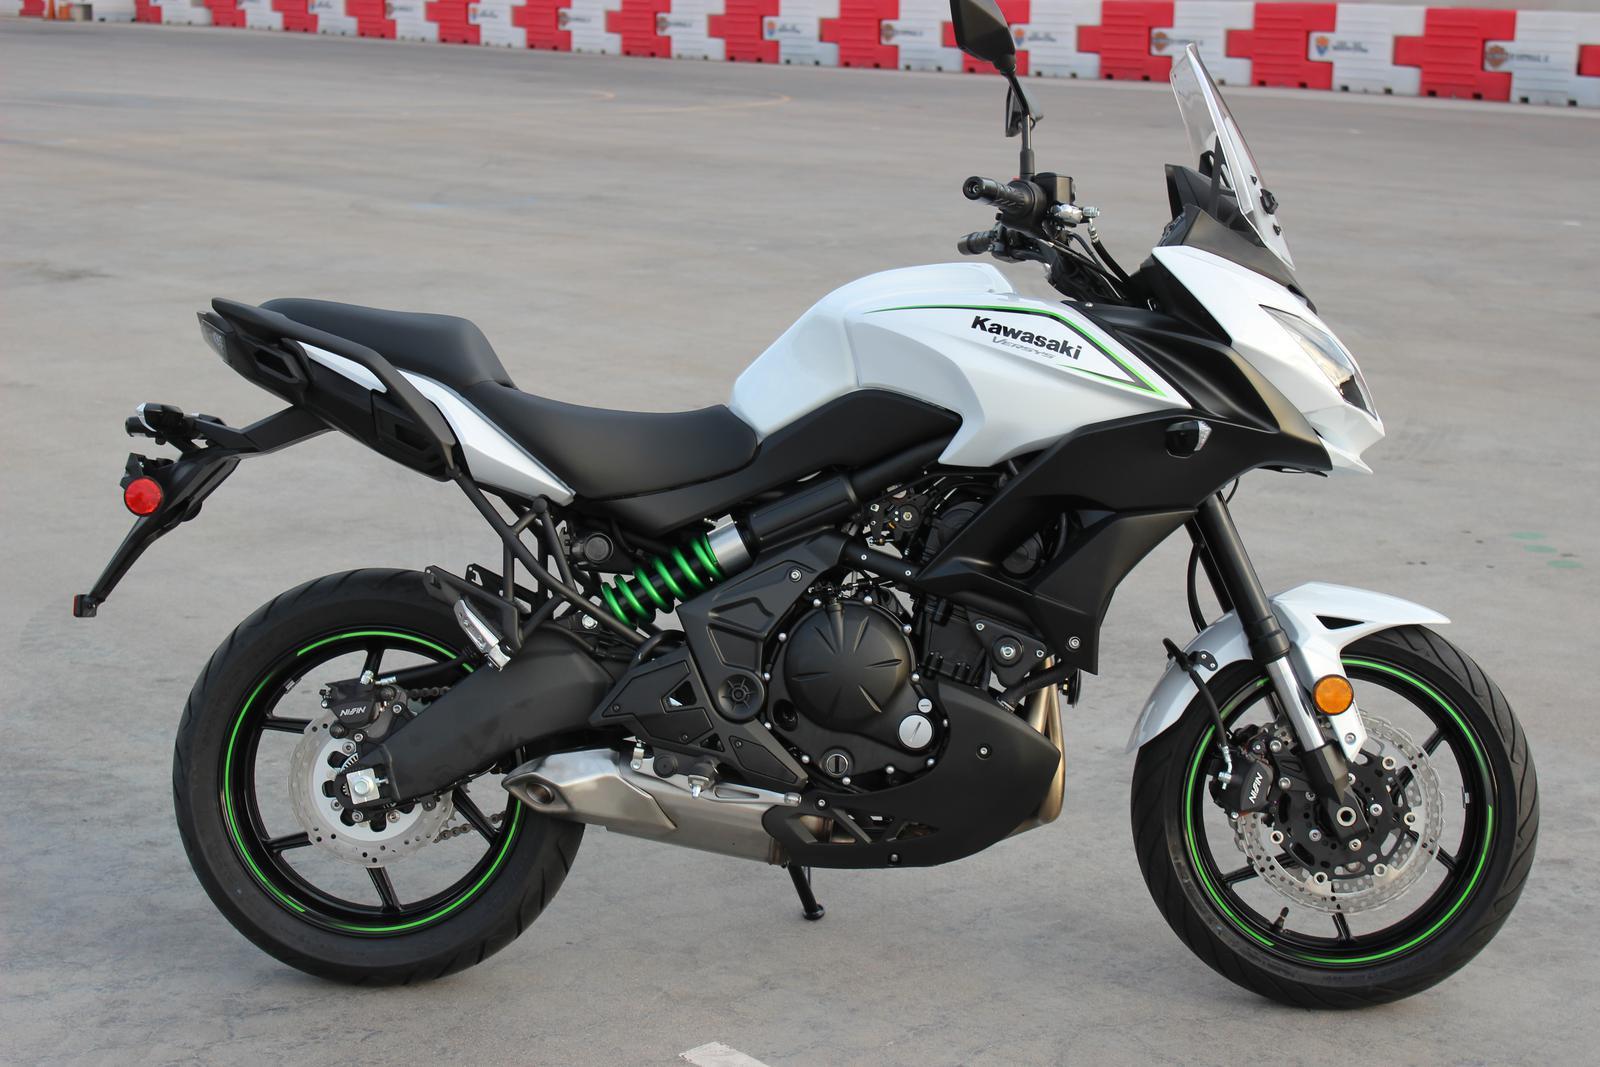 2018 Kawasaki Versys 650 ABS for sale in Scottsdale, AZ. GO AZ ...